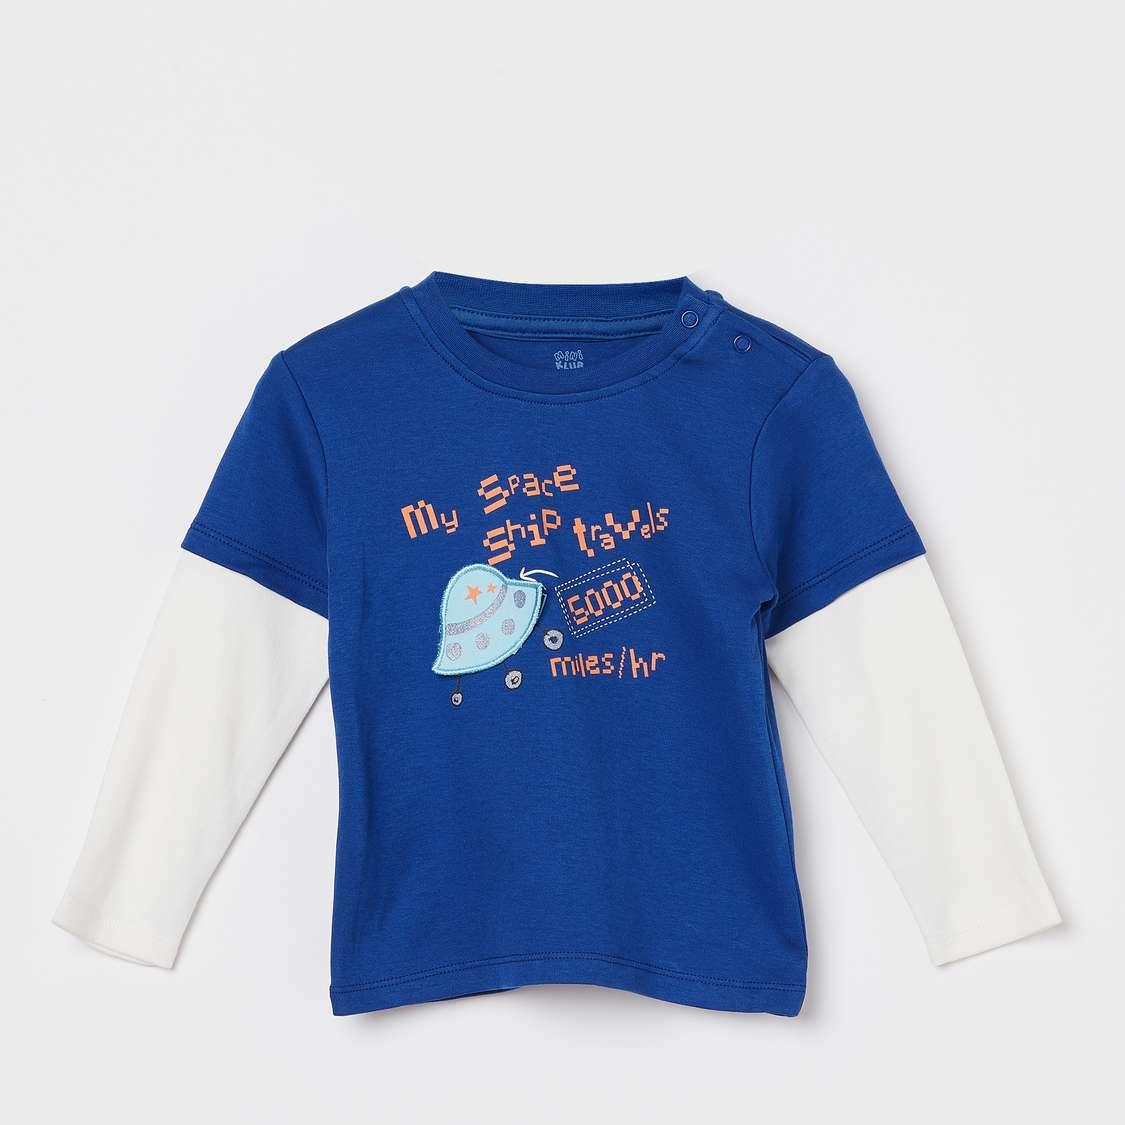 FS MINI KLUB Printed Crew-Neck T-shirt lifestyle online shopping